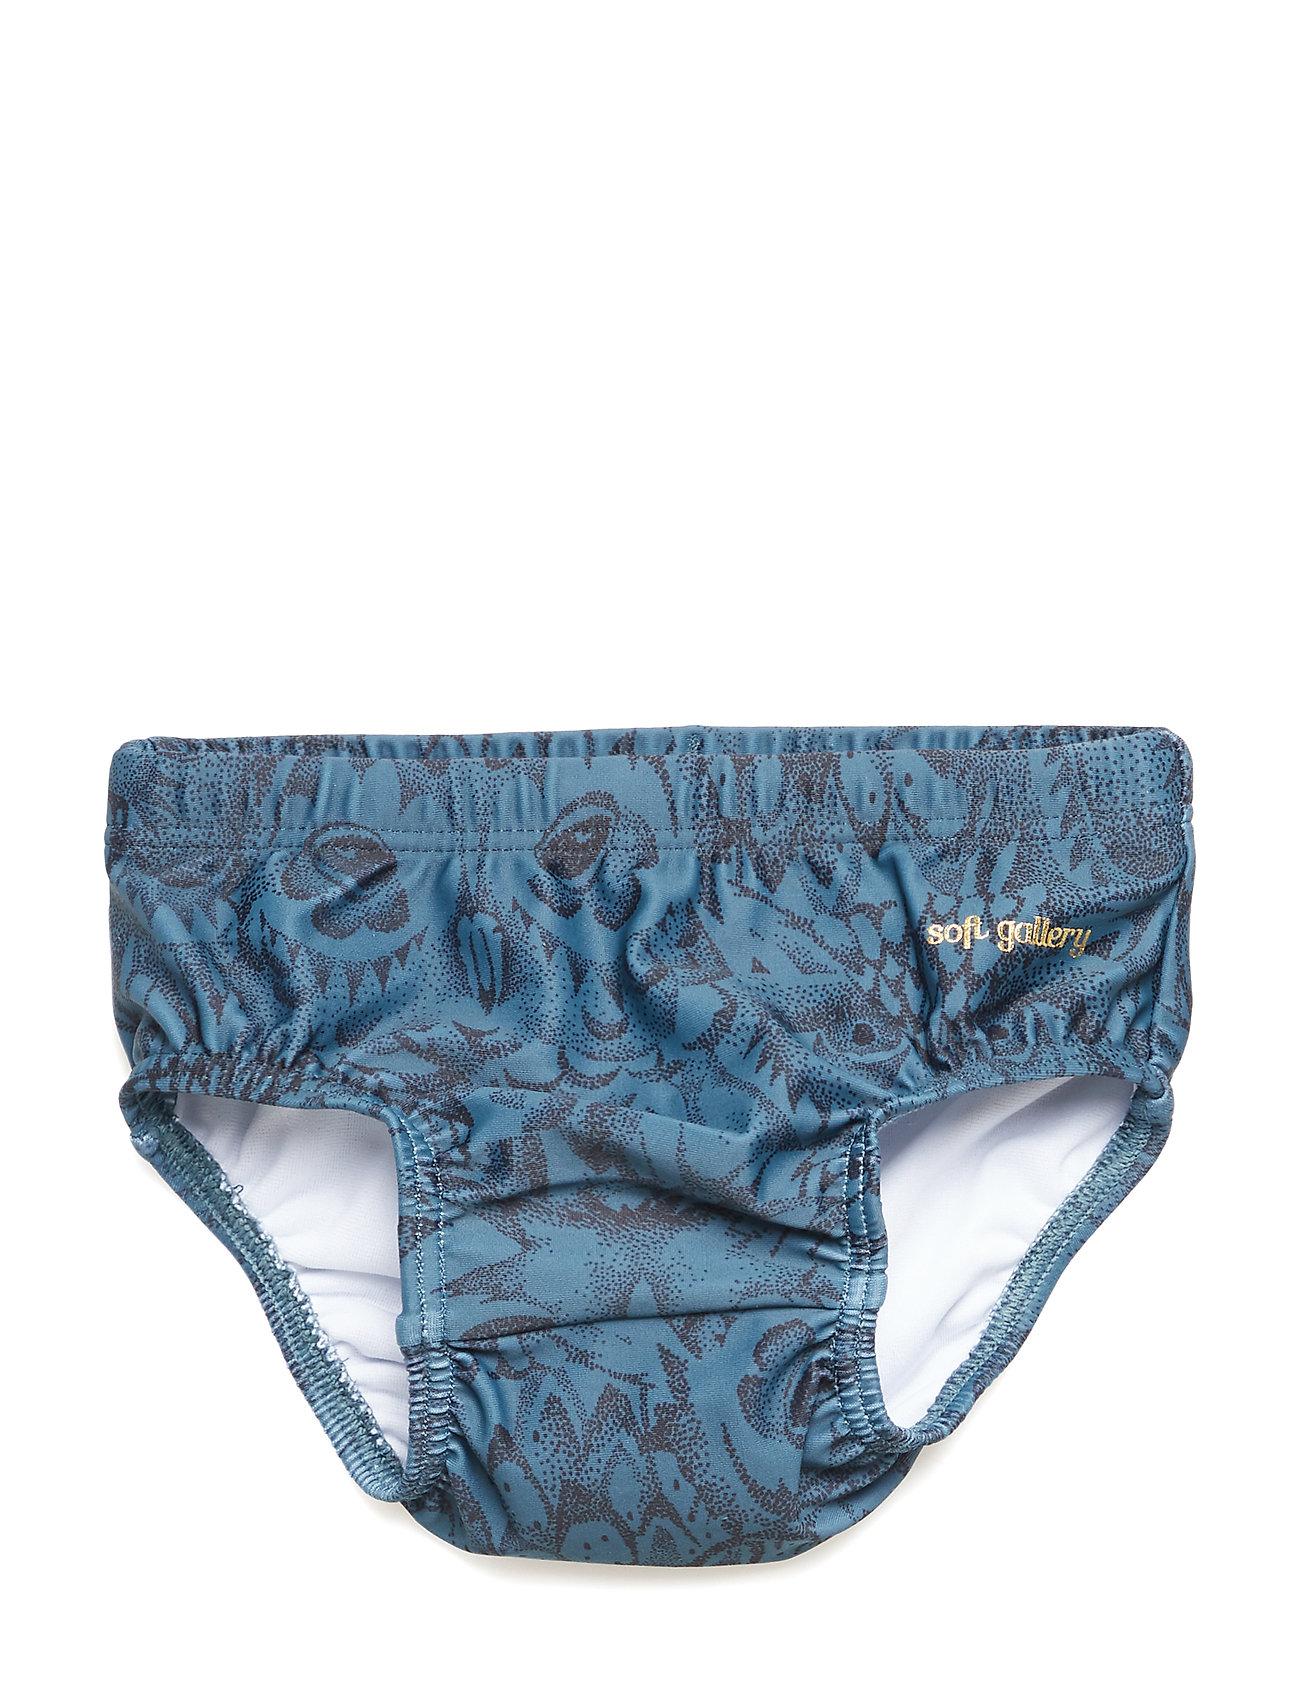 Soft Gallery Miki Swim Pants - ORION BLUE, AOP OWL